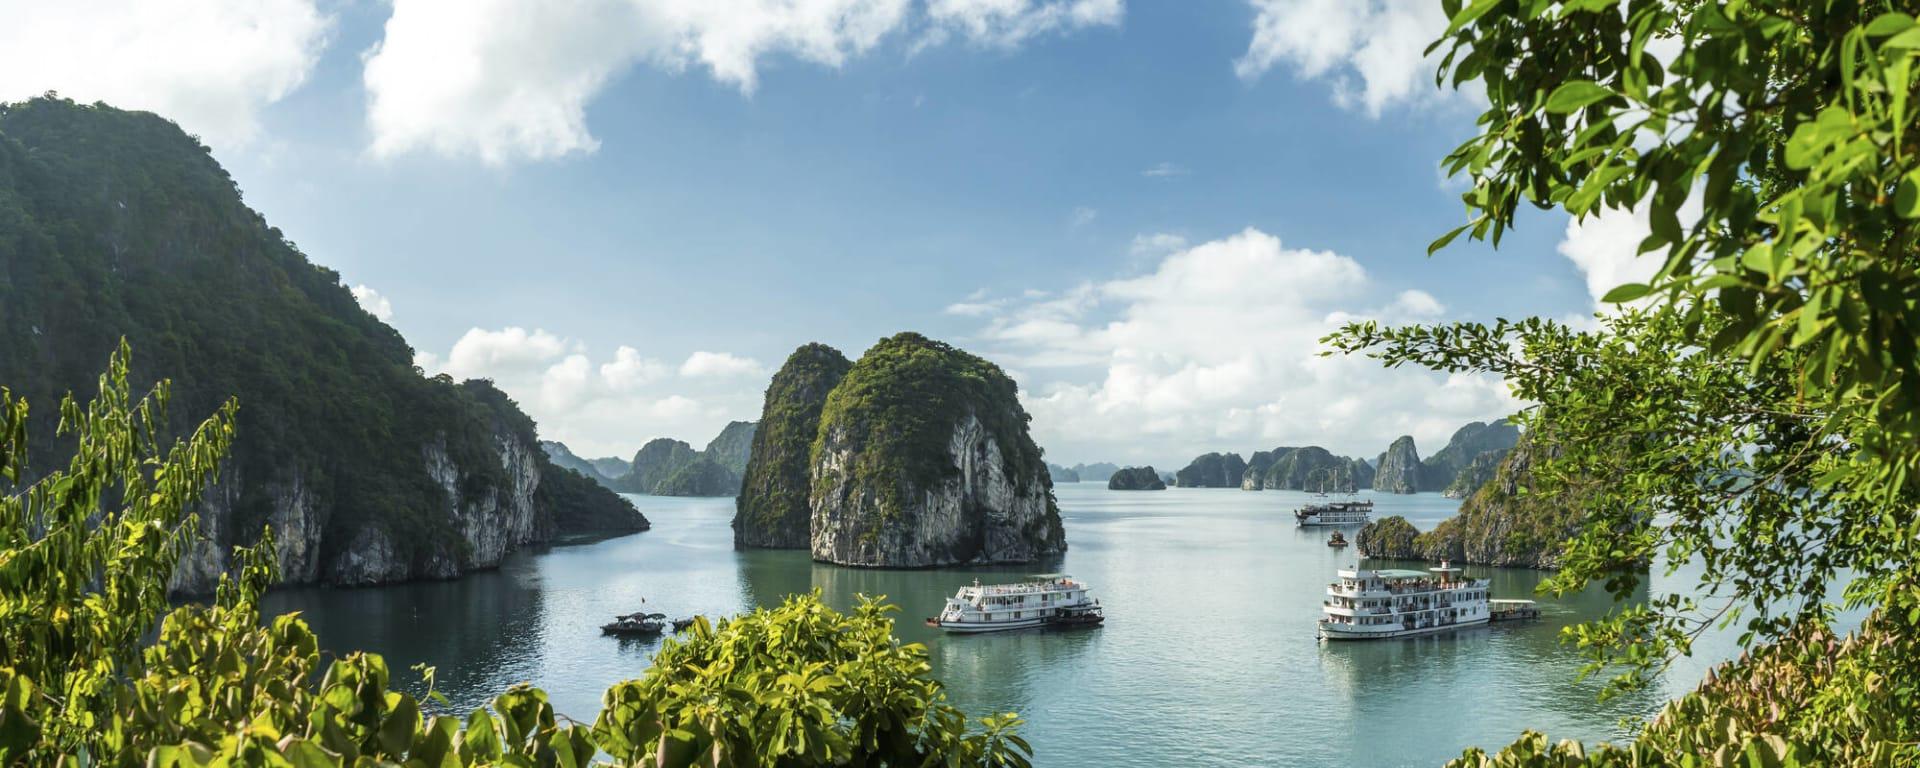 Höhepunkte Vietnams ab Hanoi: Vietnam Halong Bucht